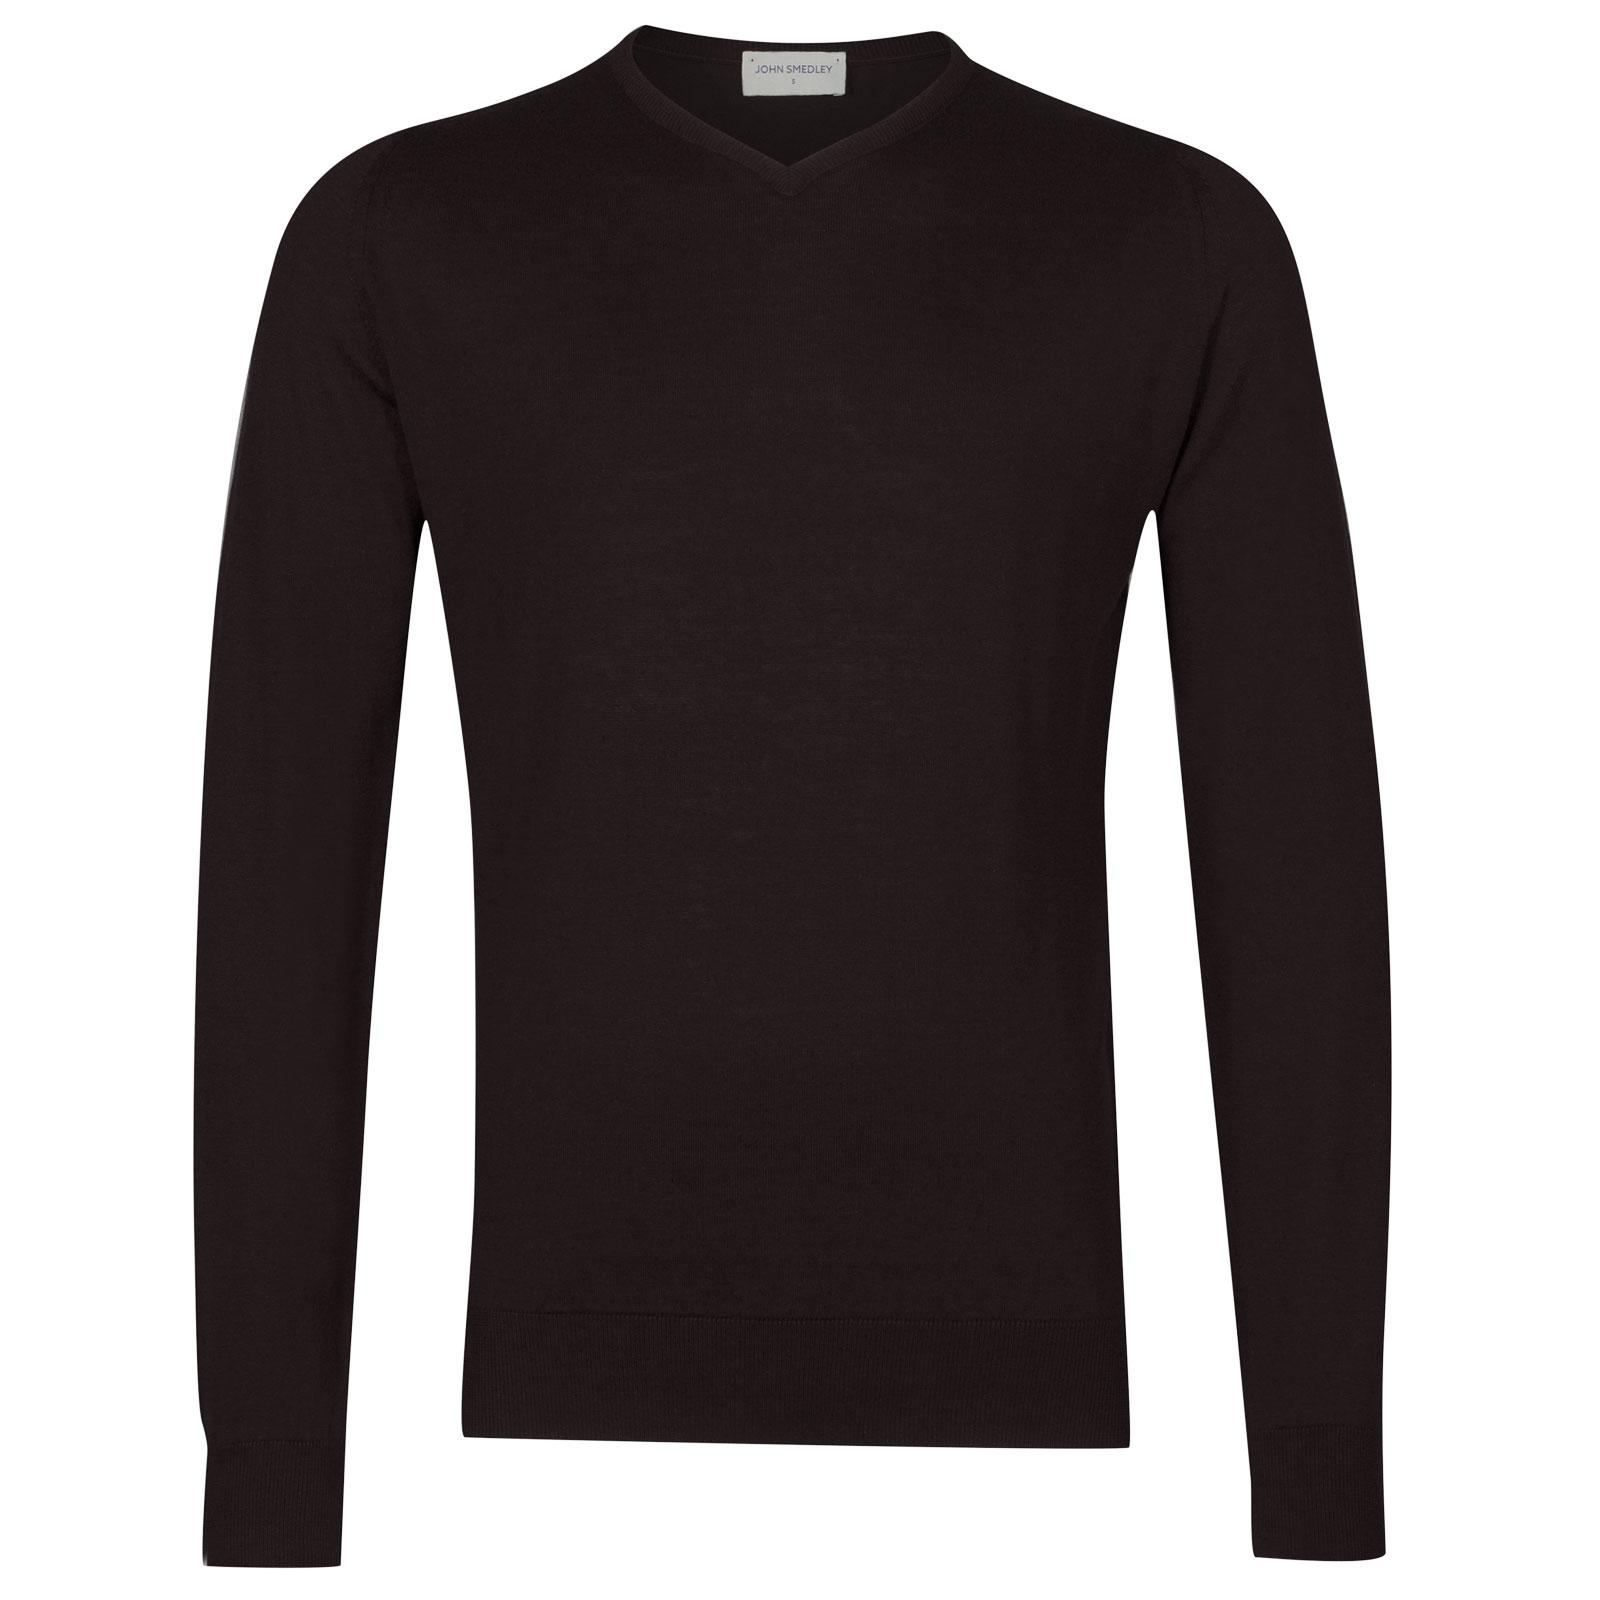 John Smedley Aydon Sea Island Cotton Pullover in Dark Leather-L